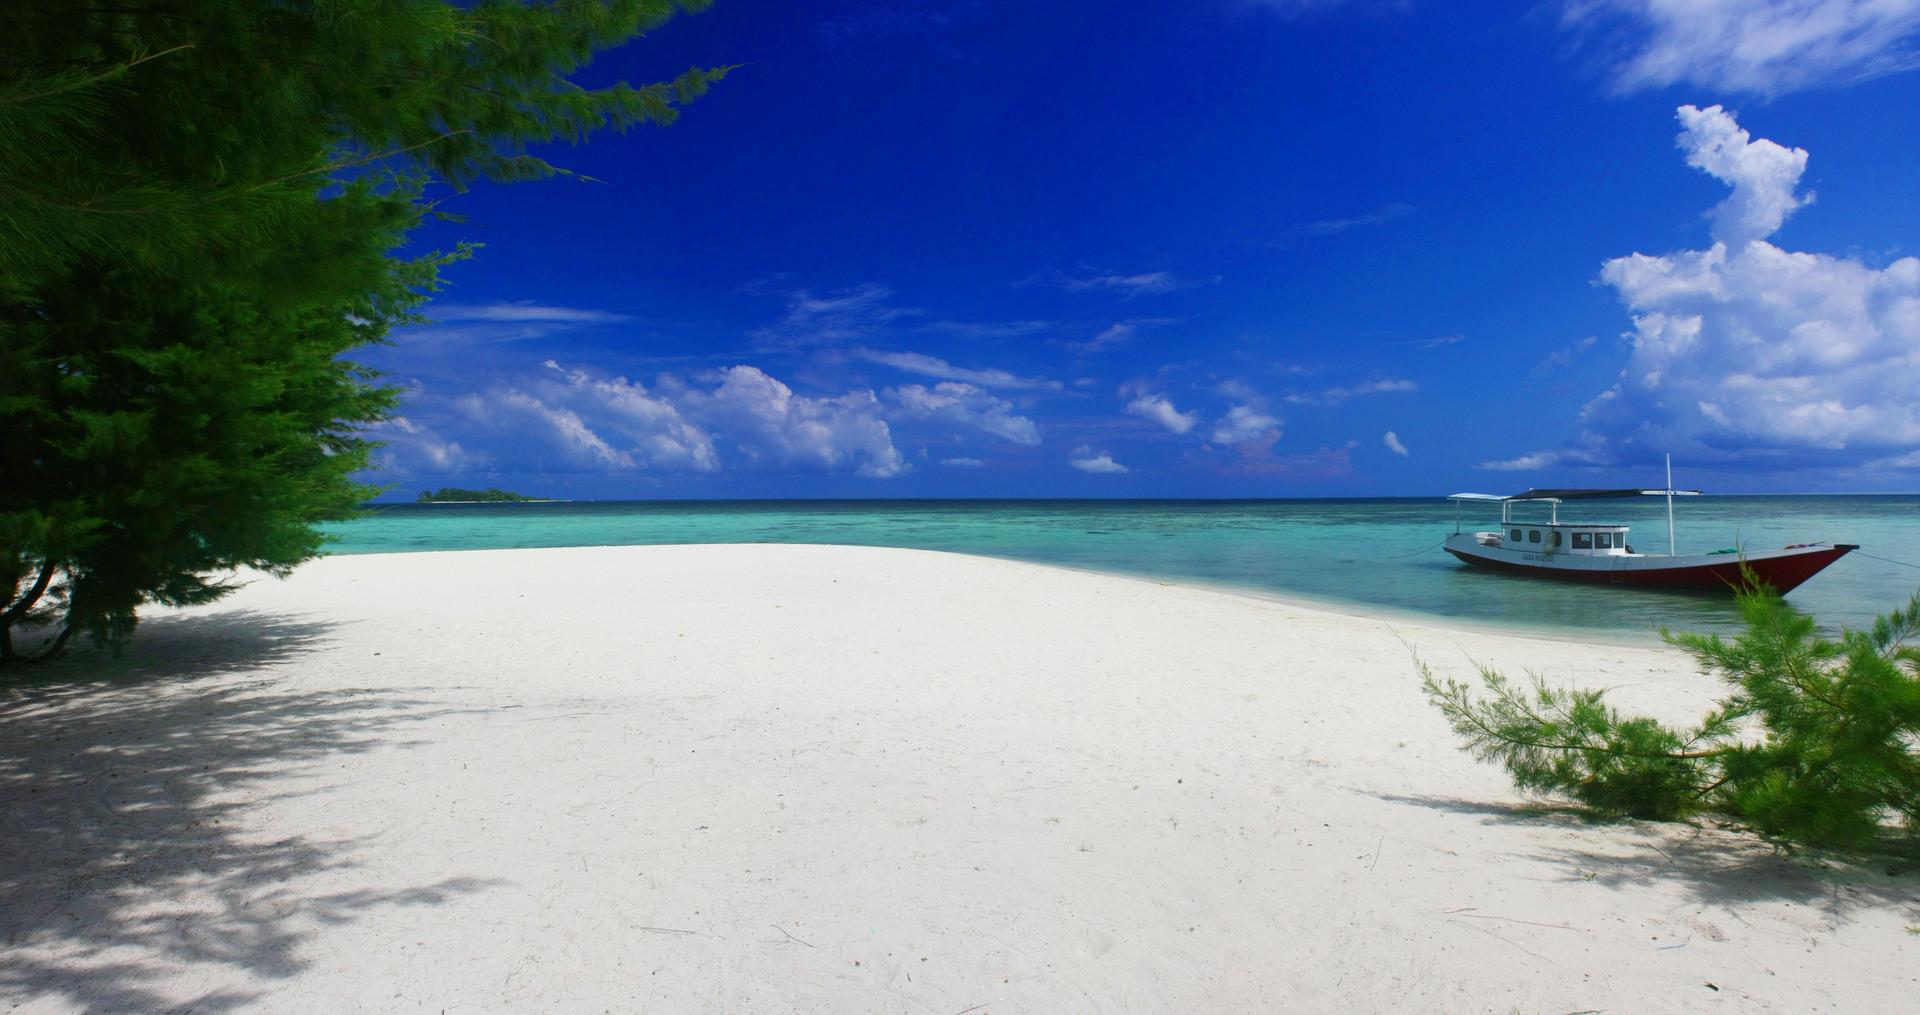 Geleang_Island_Karimunjawa.jpg